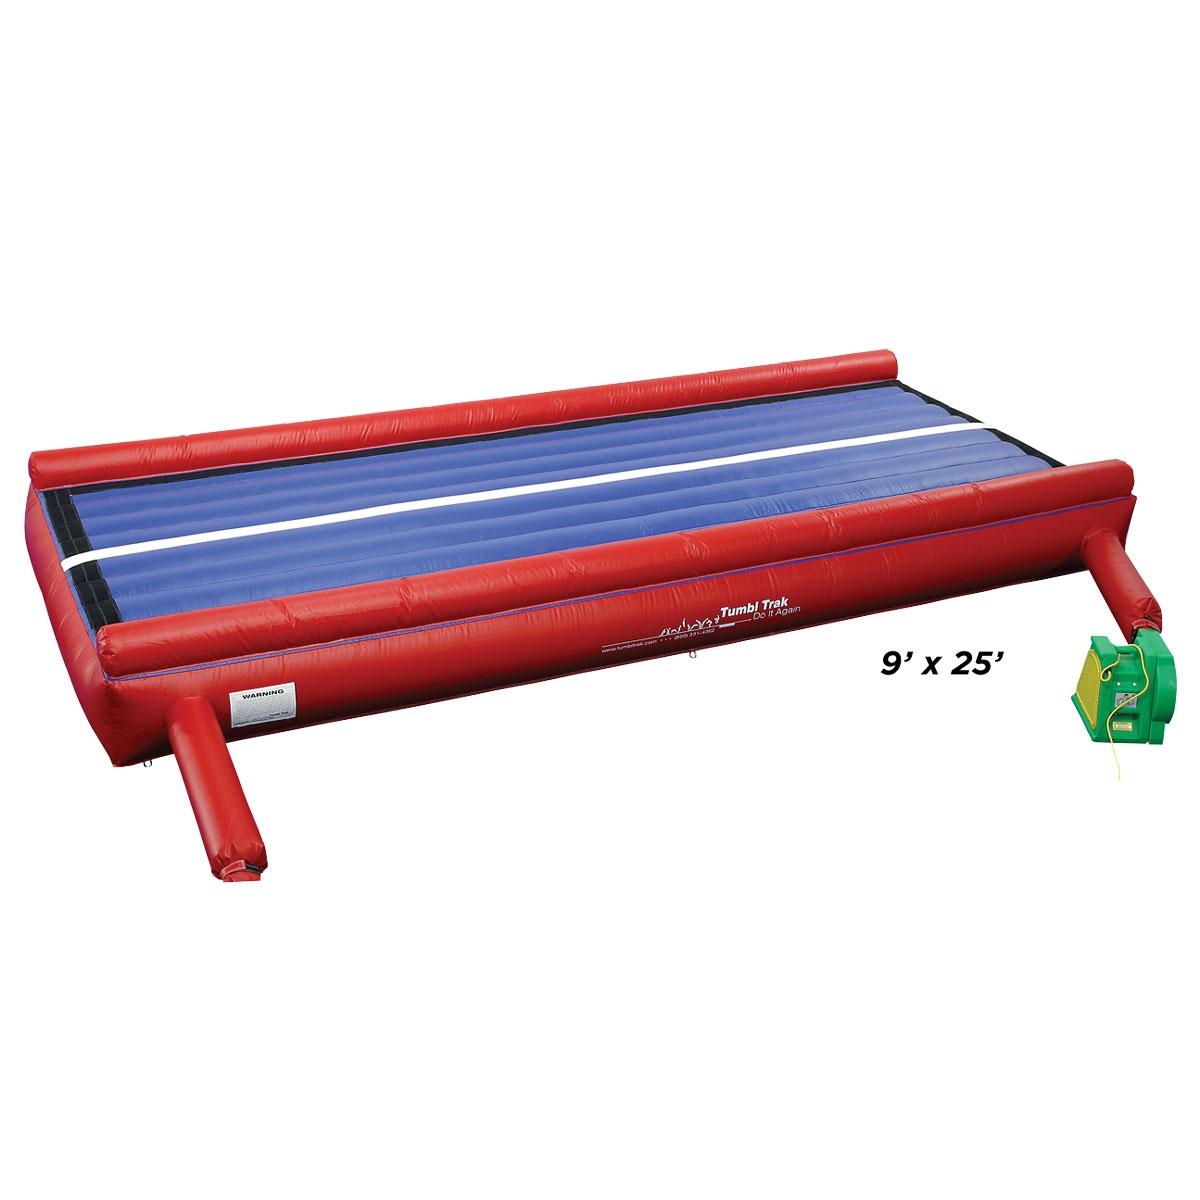 red air trak for cheer tumbling training | mancino mats